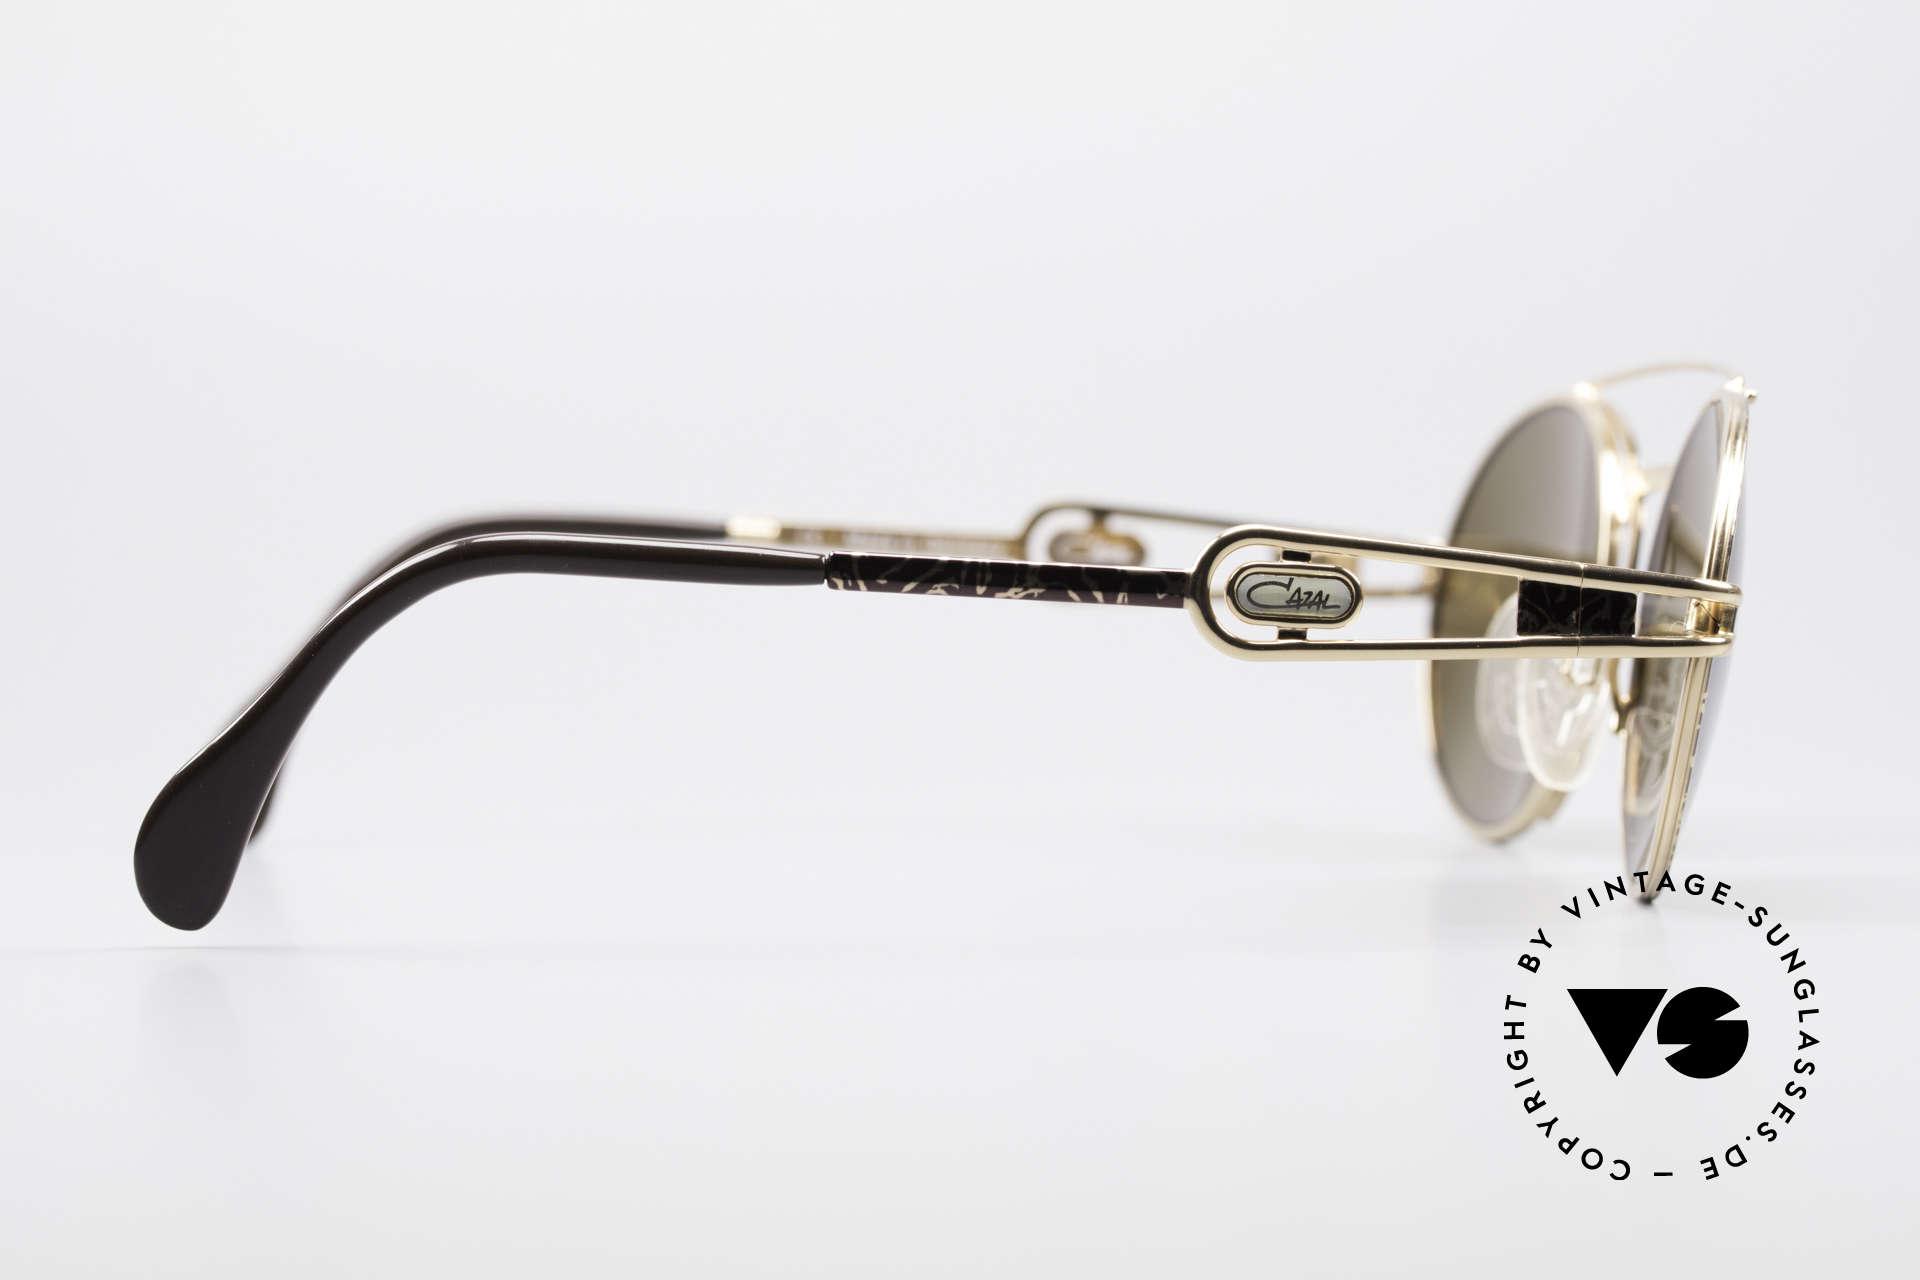 Cazal 965 90s Steampunk Oval Shades, Cazal sun lenses with 'UV Protection' mark (100% UV), Made for Men and Women